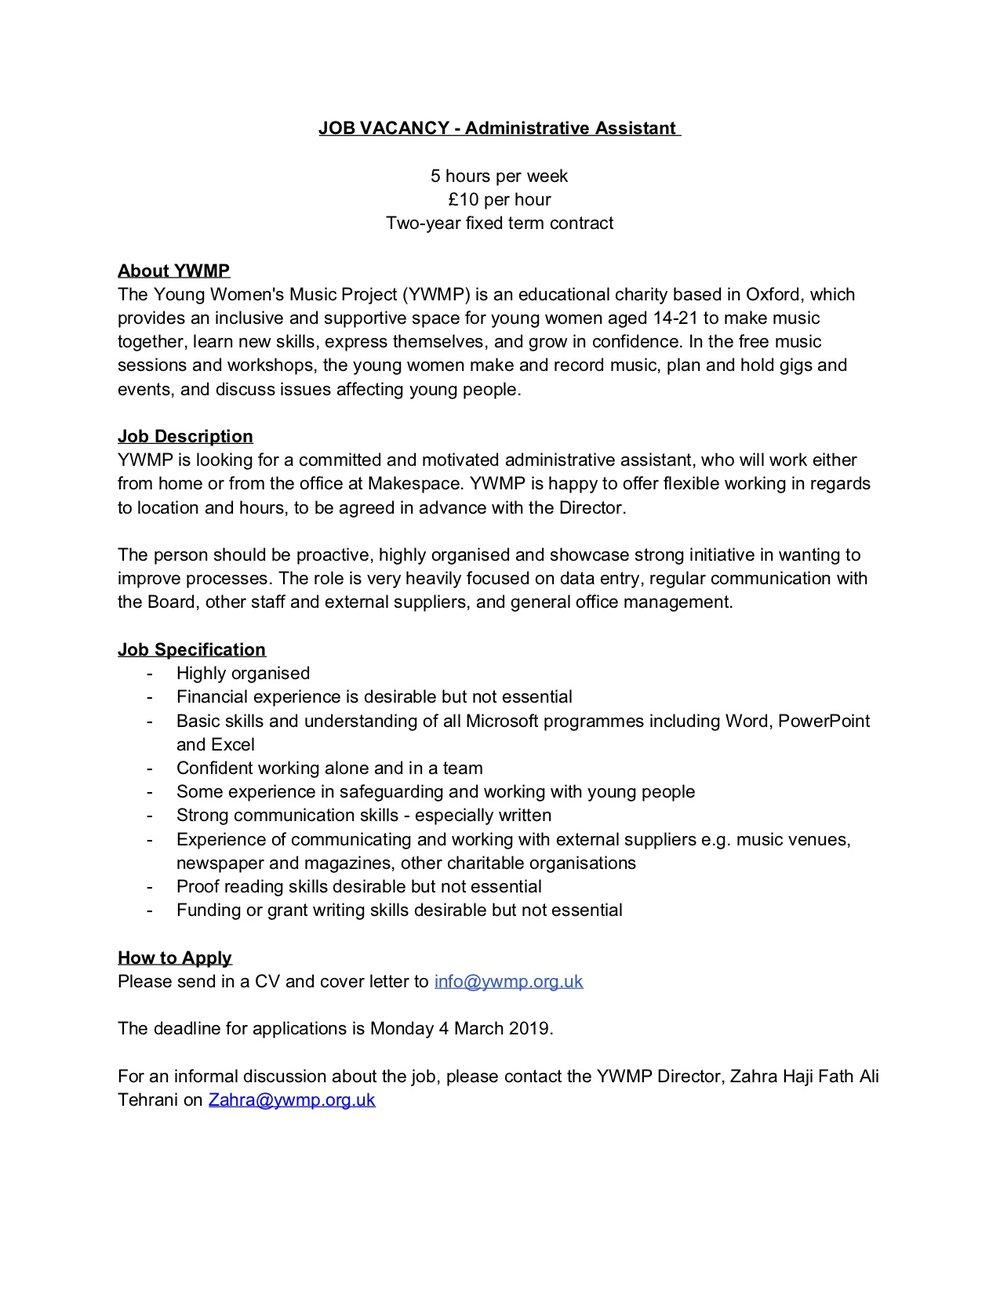 YWMP JOB VACANCY - Administrative Assistant.jpg